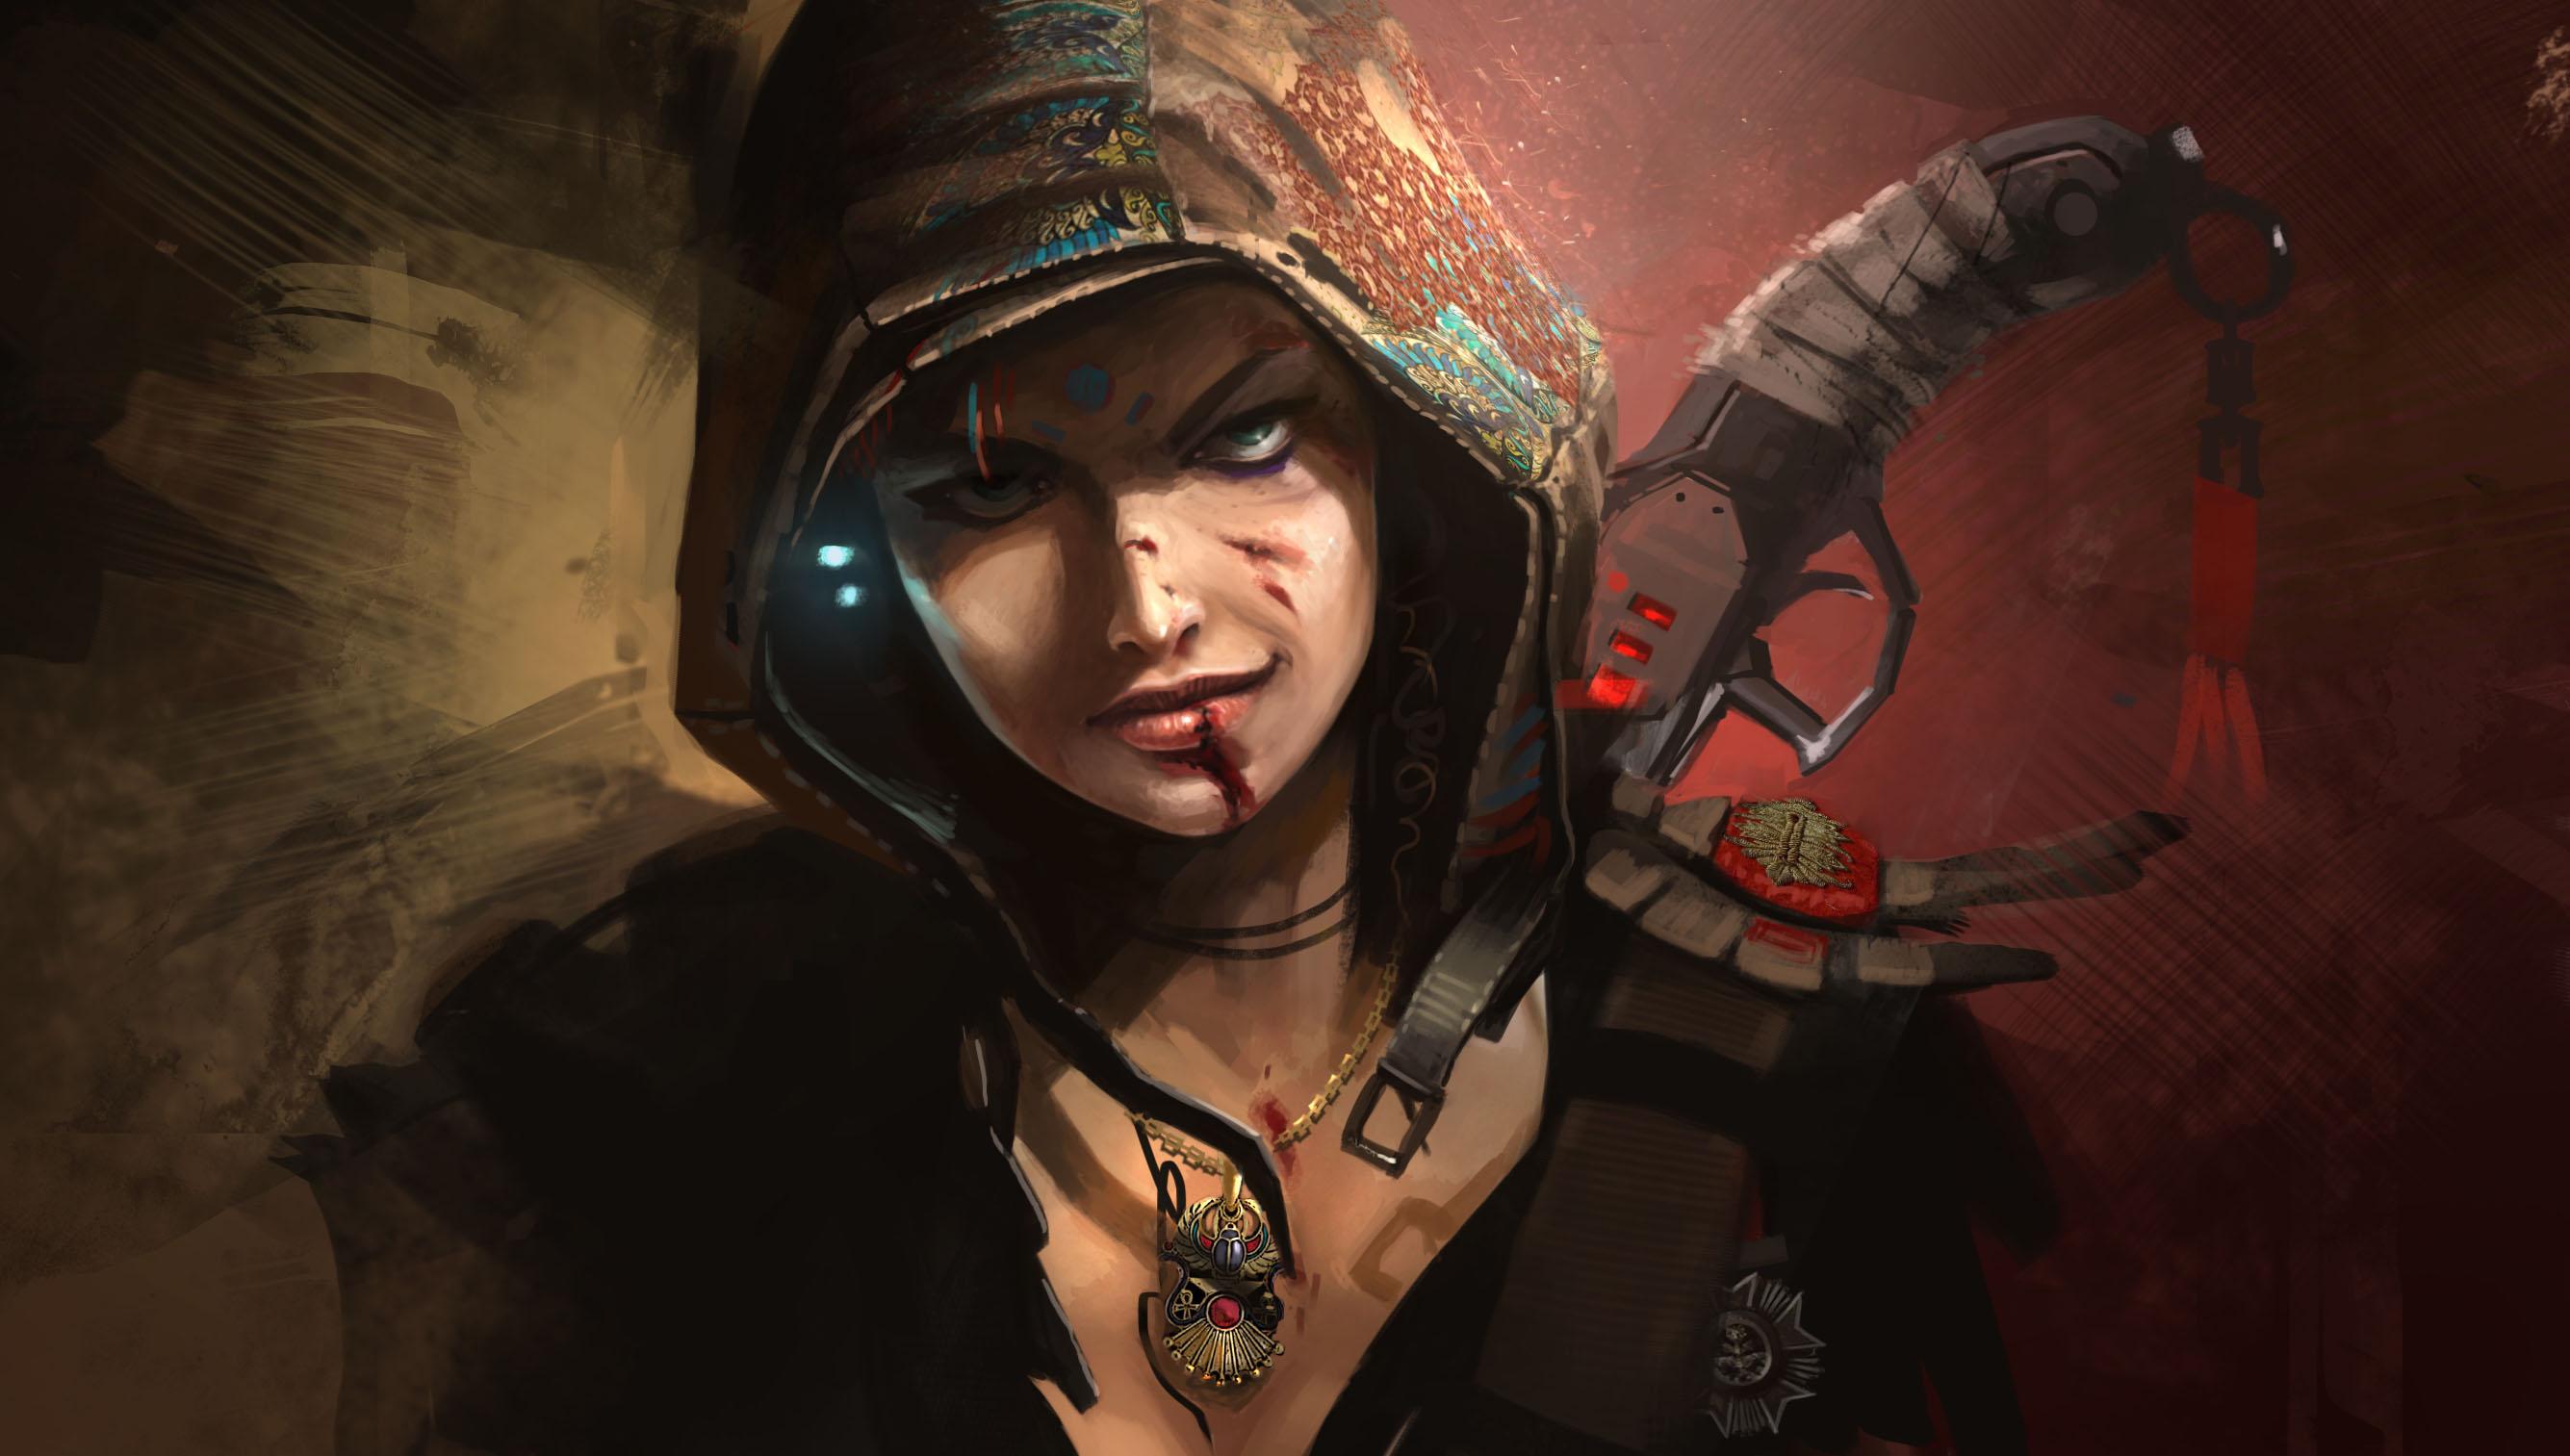 download wallpaper female warrior - photo #44